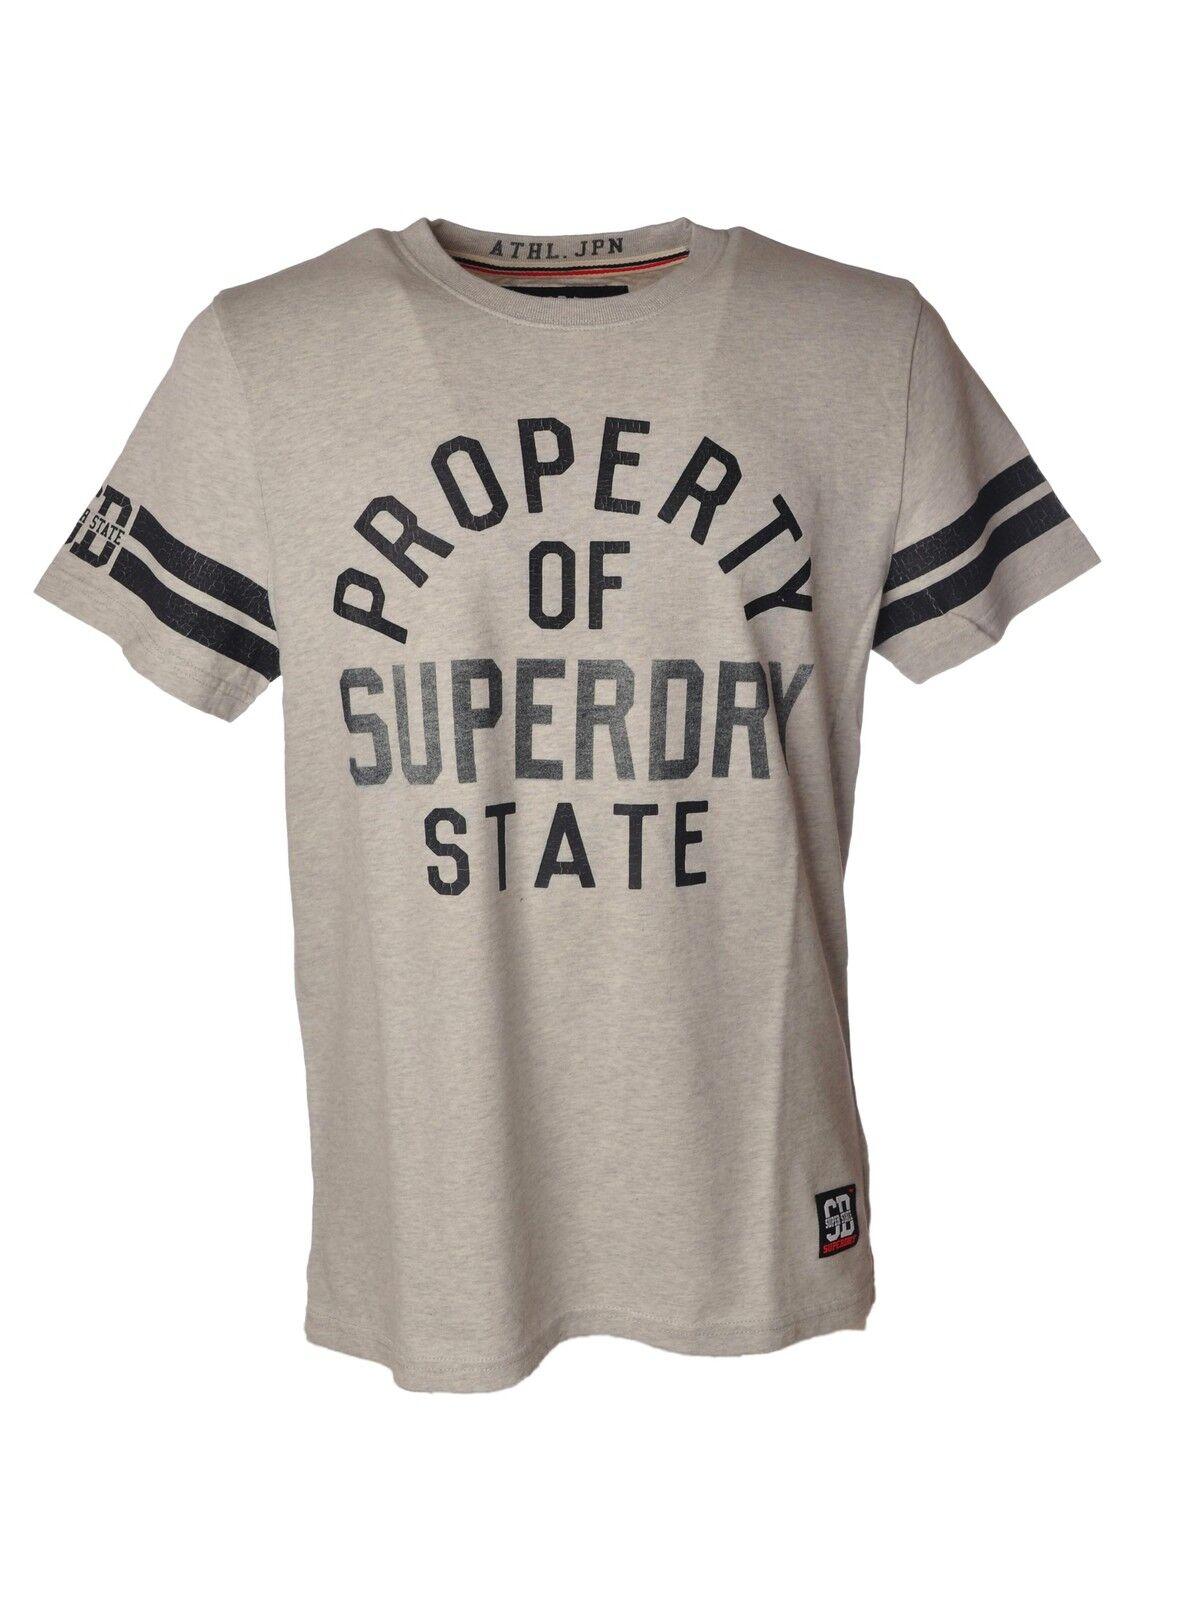 Superdry - Topwear-T-shirts - Man - Grau - 3830403N184304